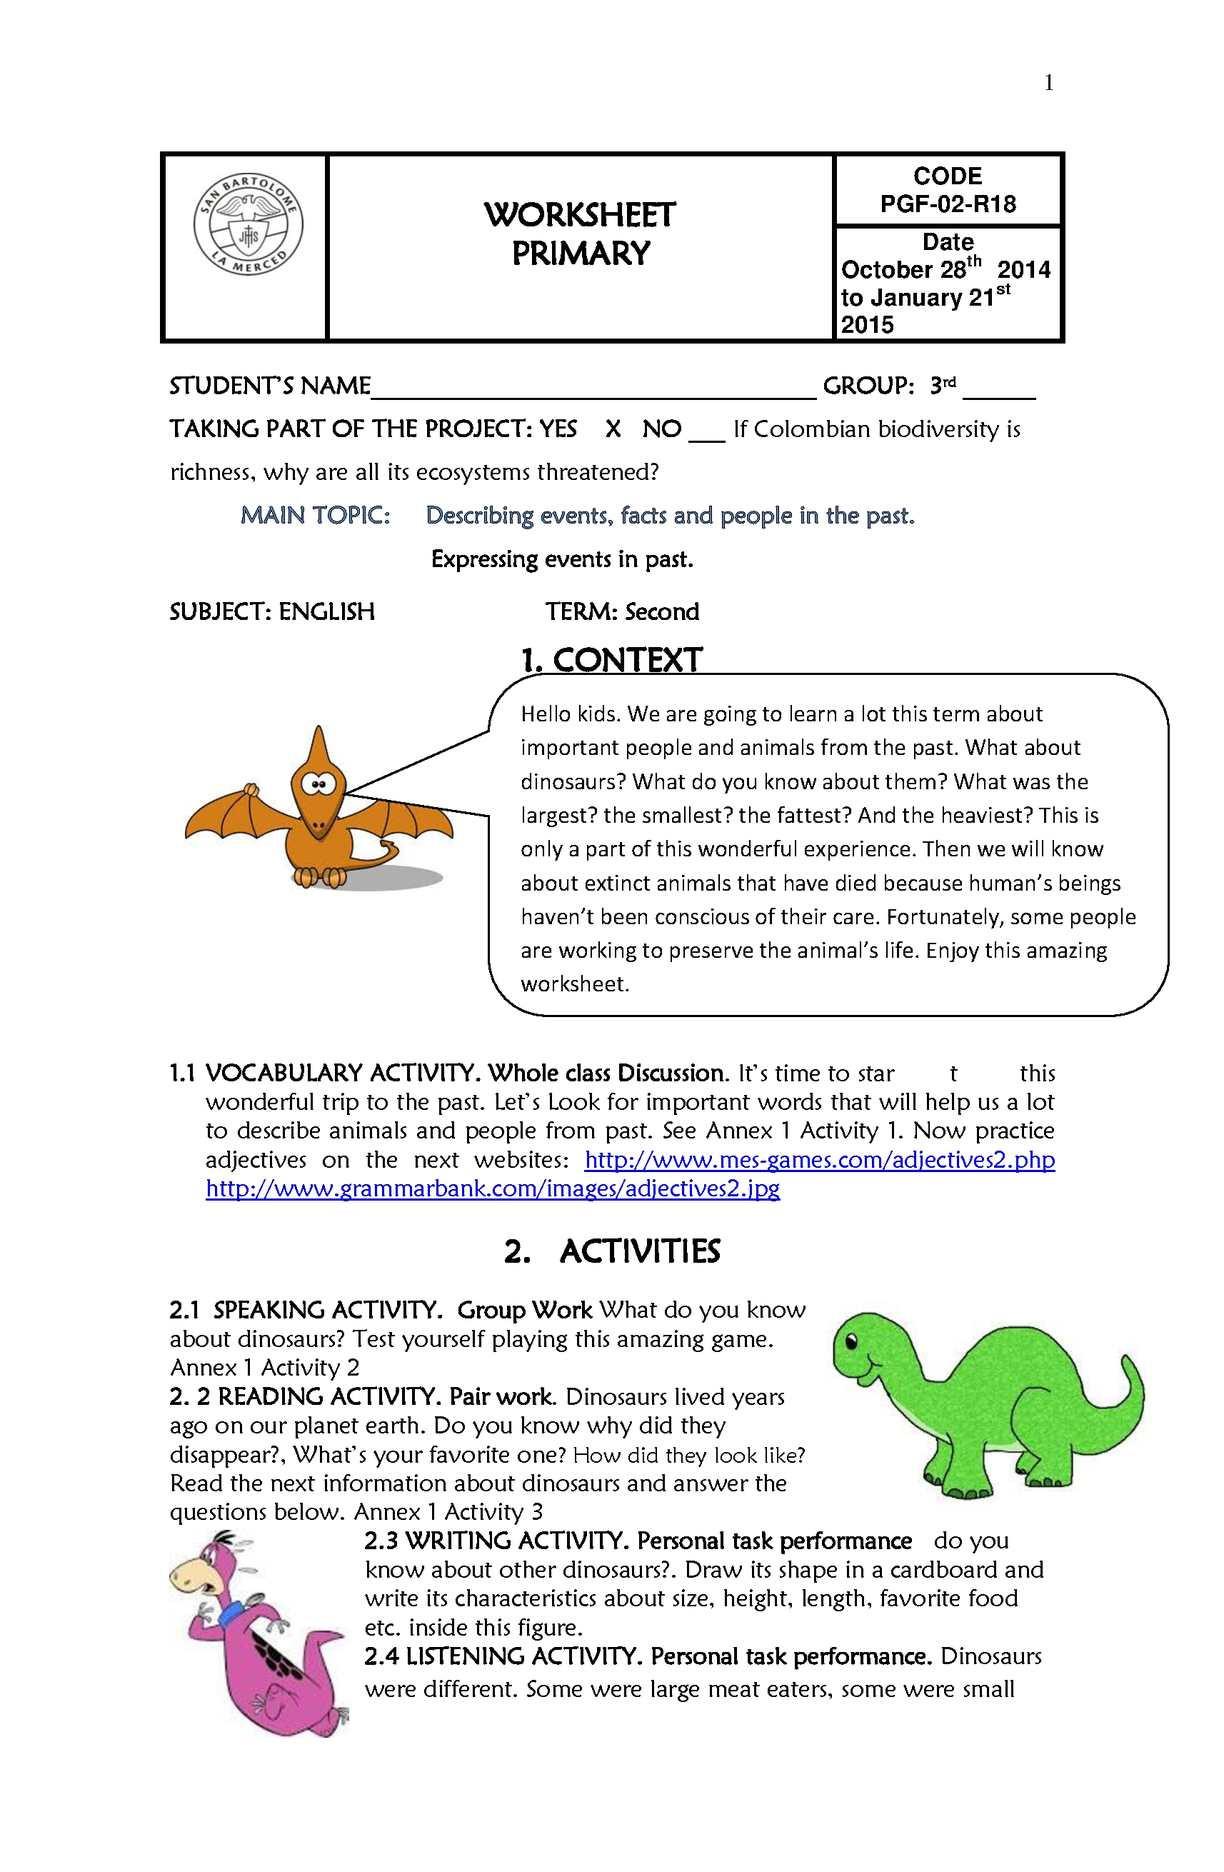 3rd Grade Ecosystem Worksheets Calaméo Worksheet Third Grade Second Term